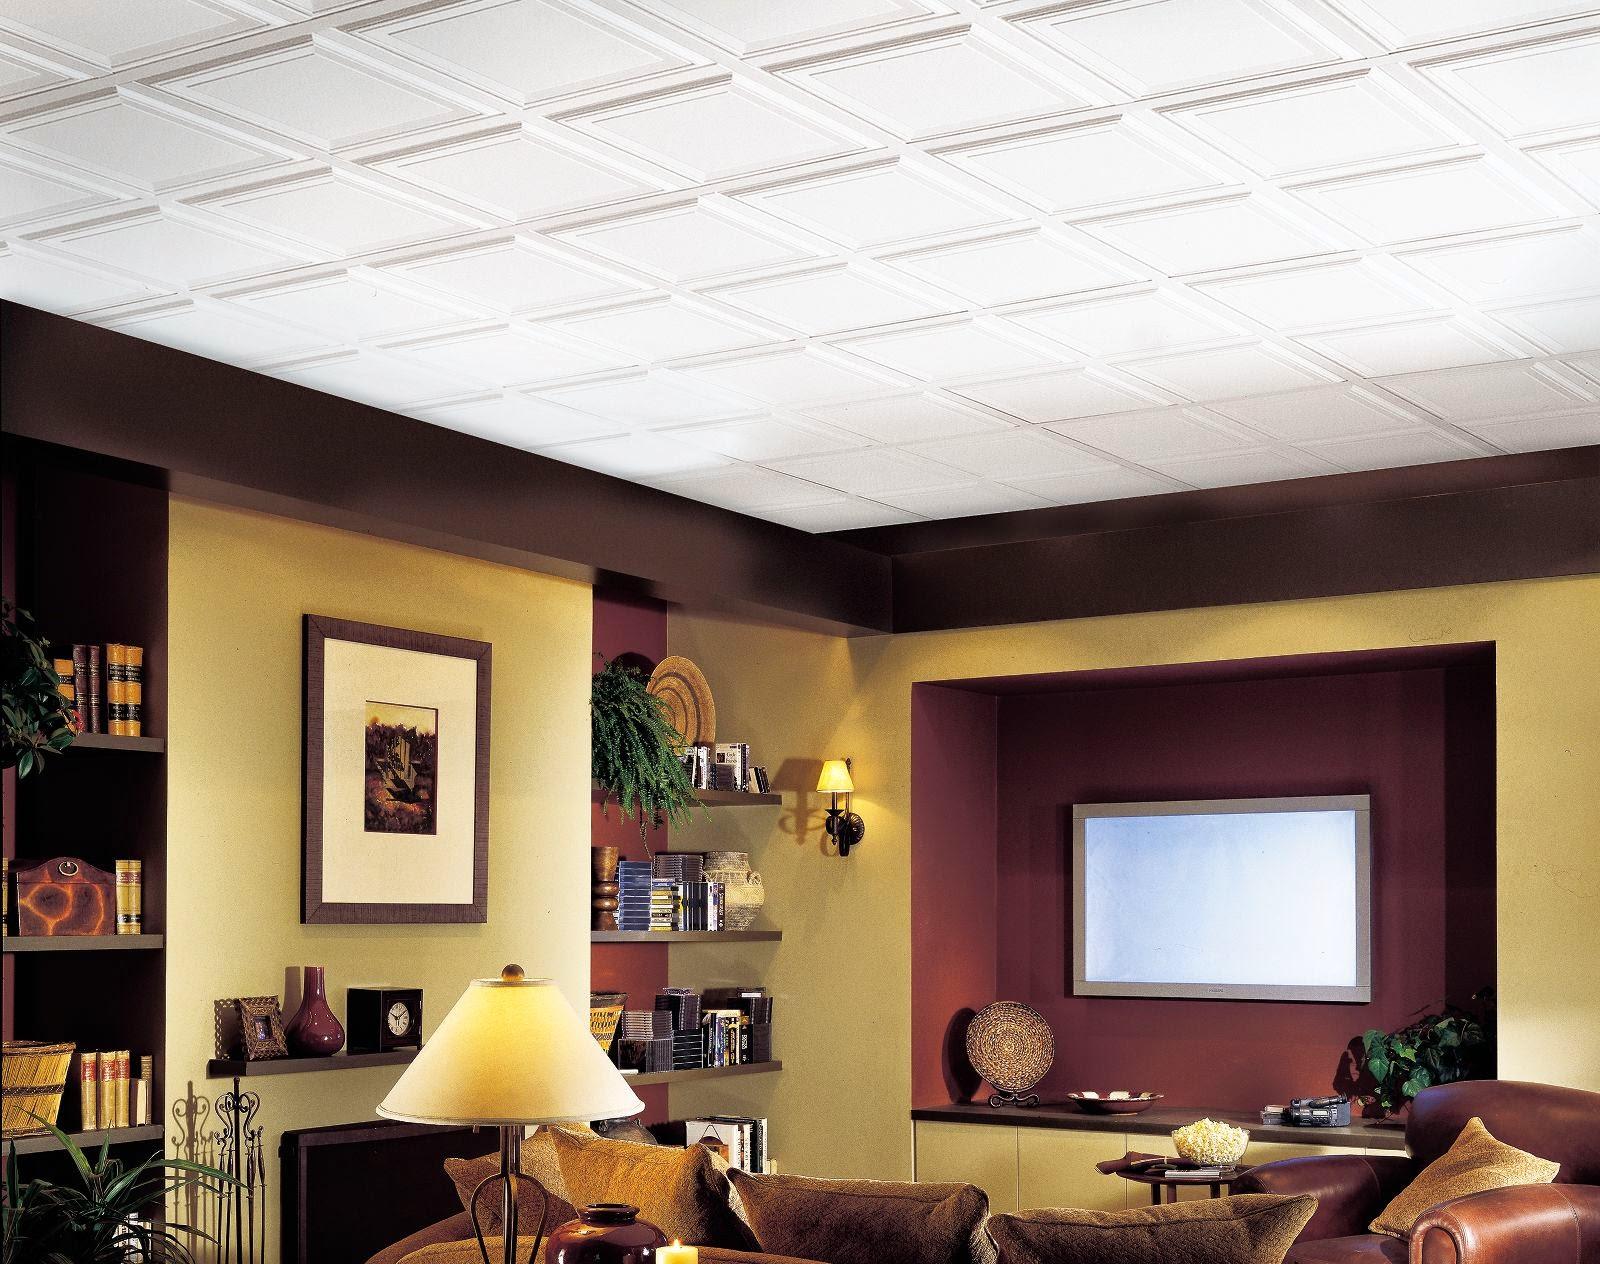 Inspirational Design Of Ceiling Tiles Drop Ceiling Best Home